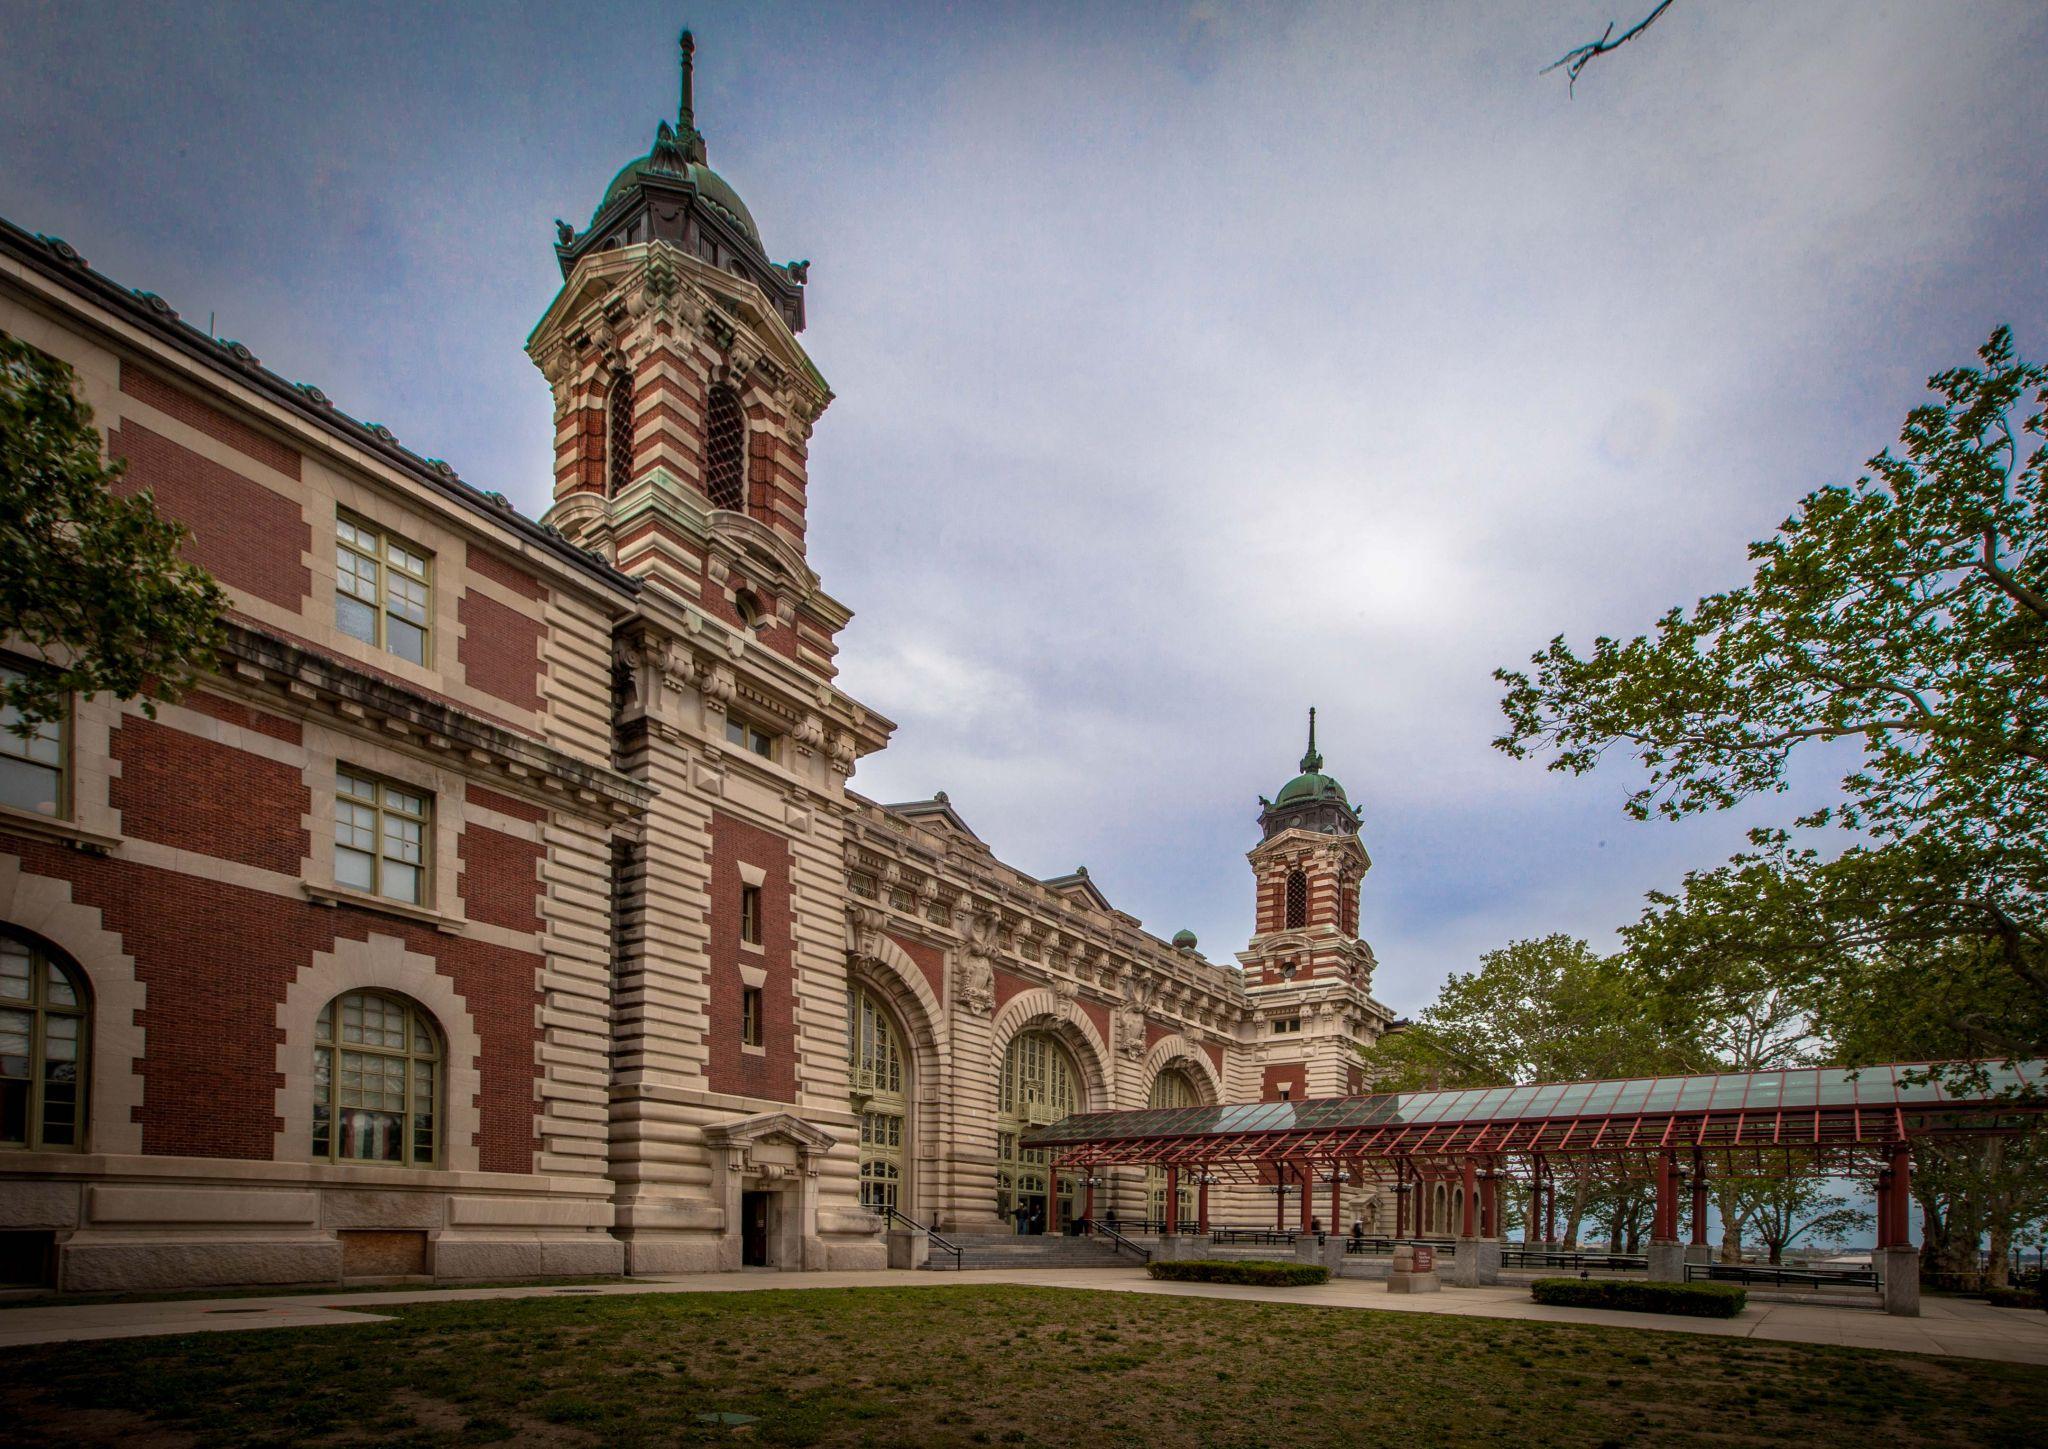 Ellis Island Immigration Station New York, USA